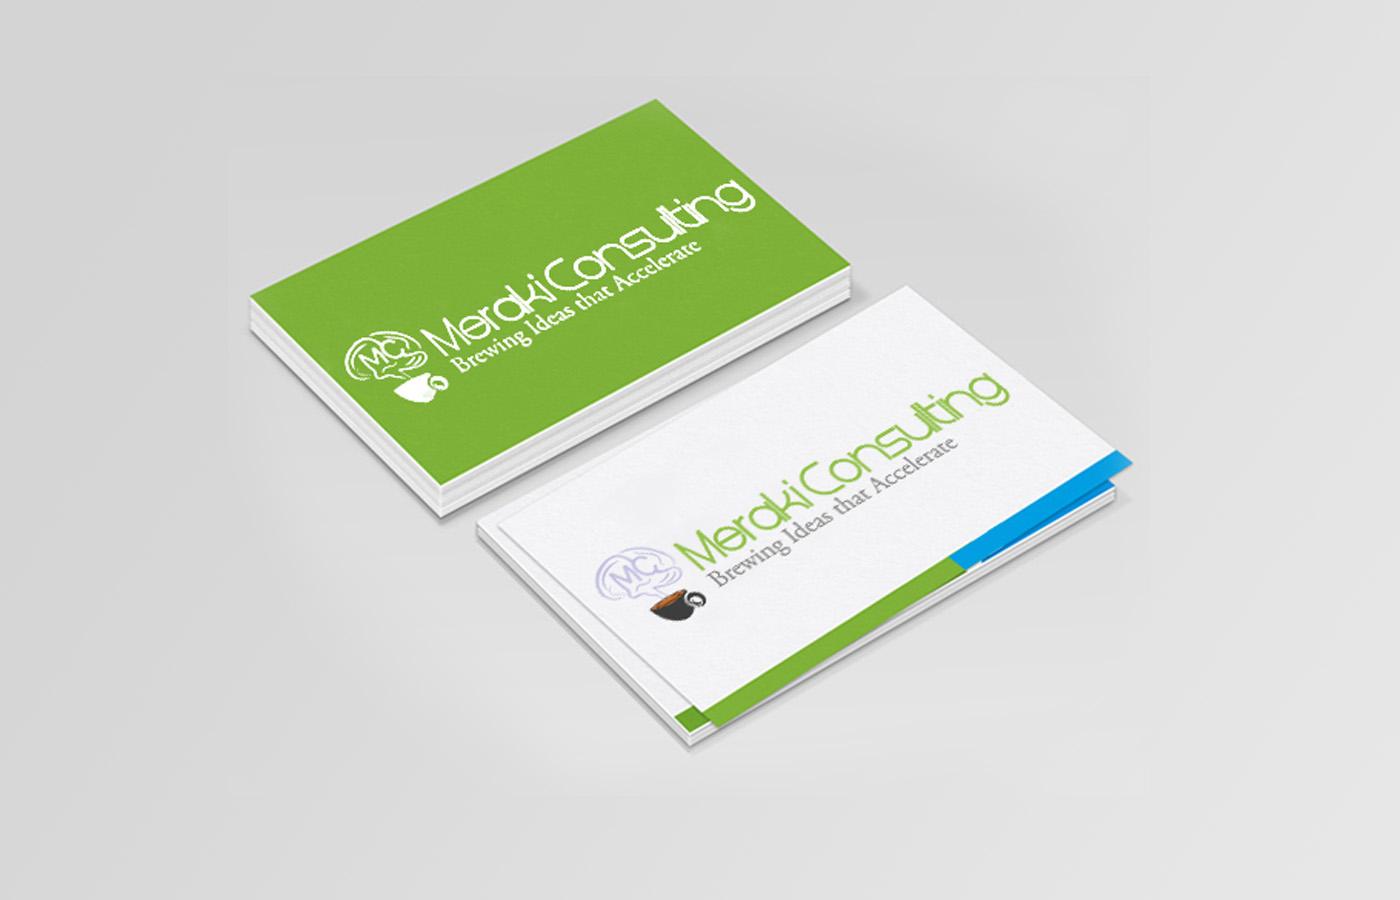 meraki-consulting-business-card - Designing Fever Gallery